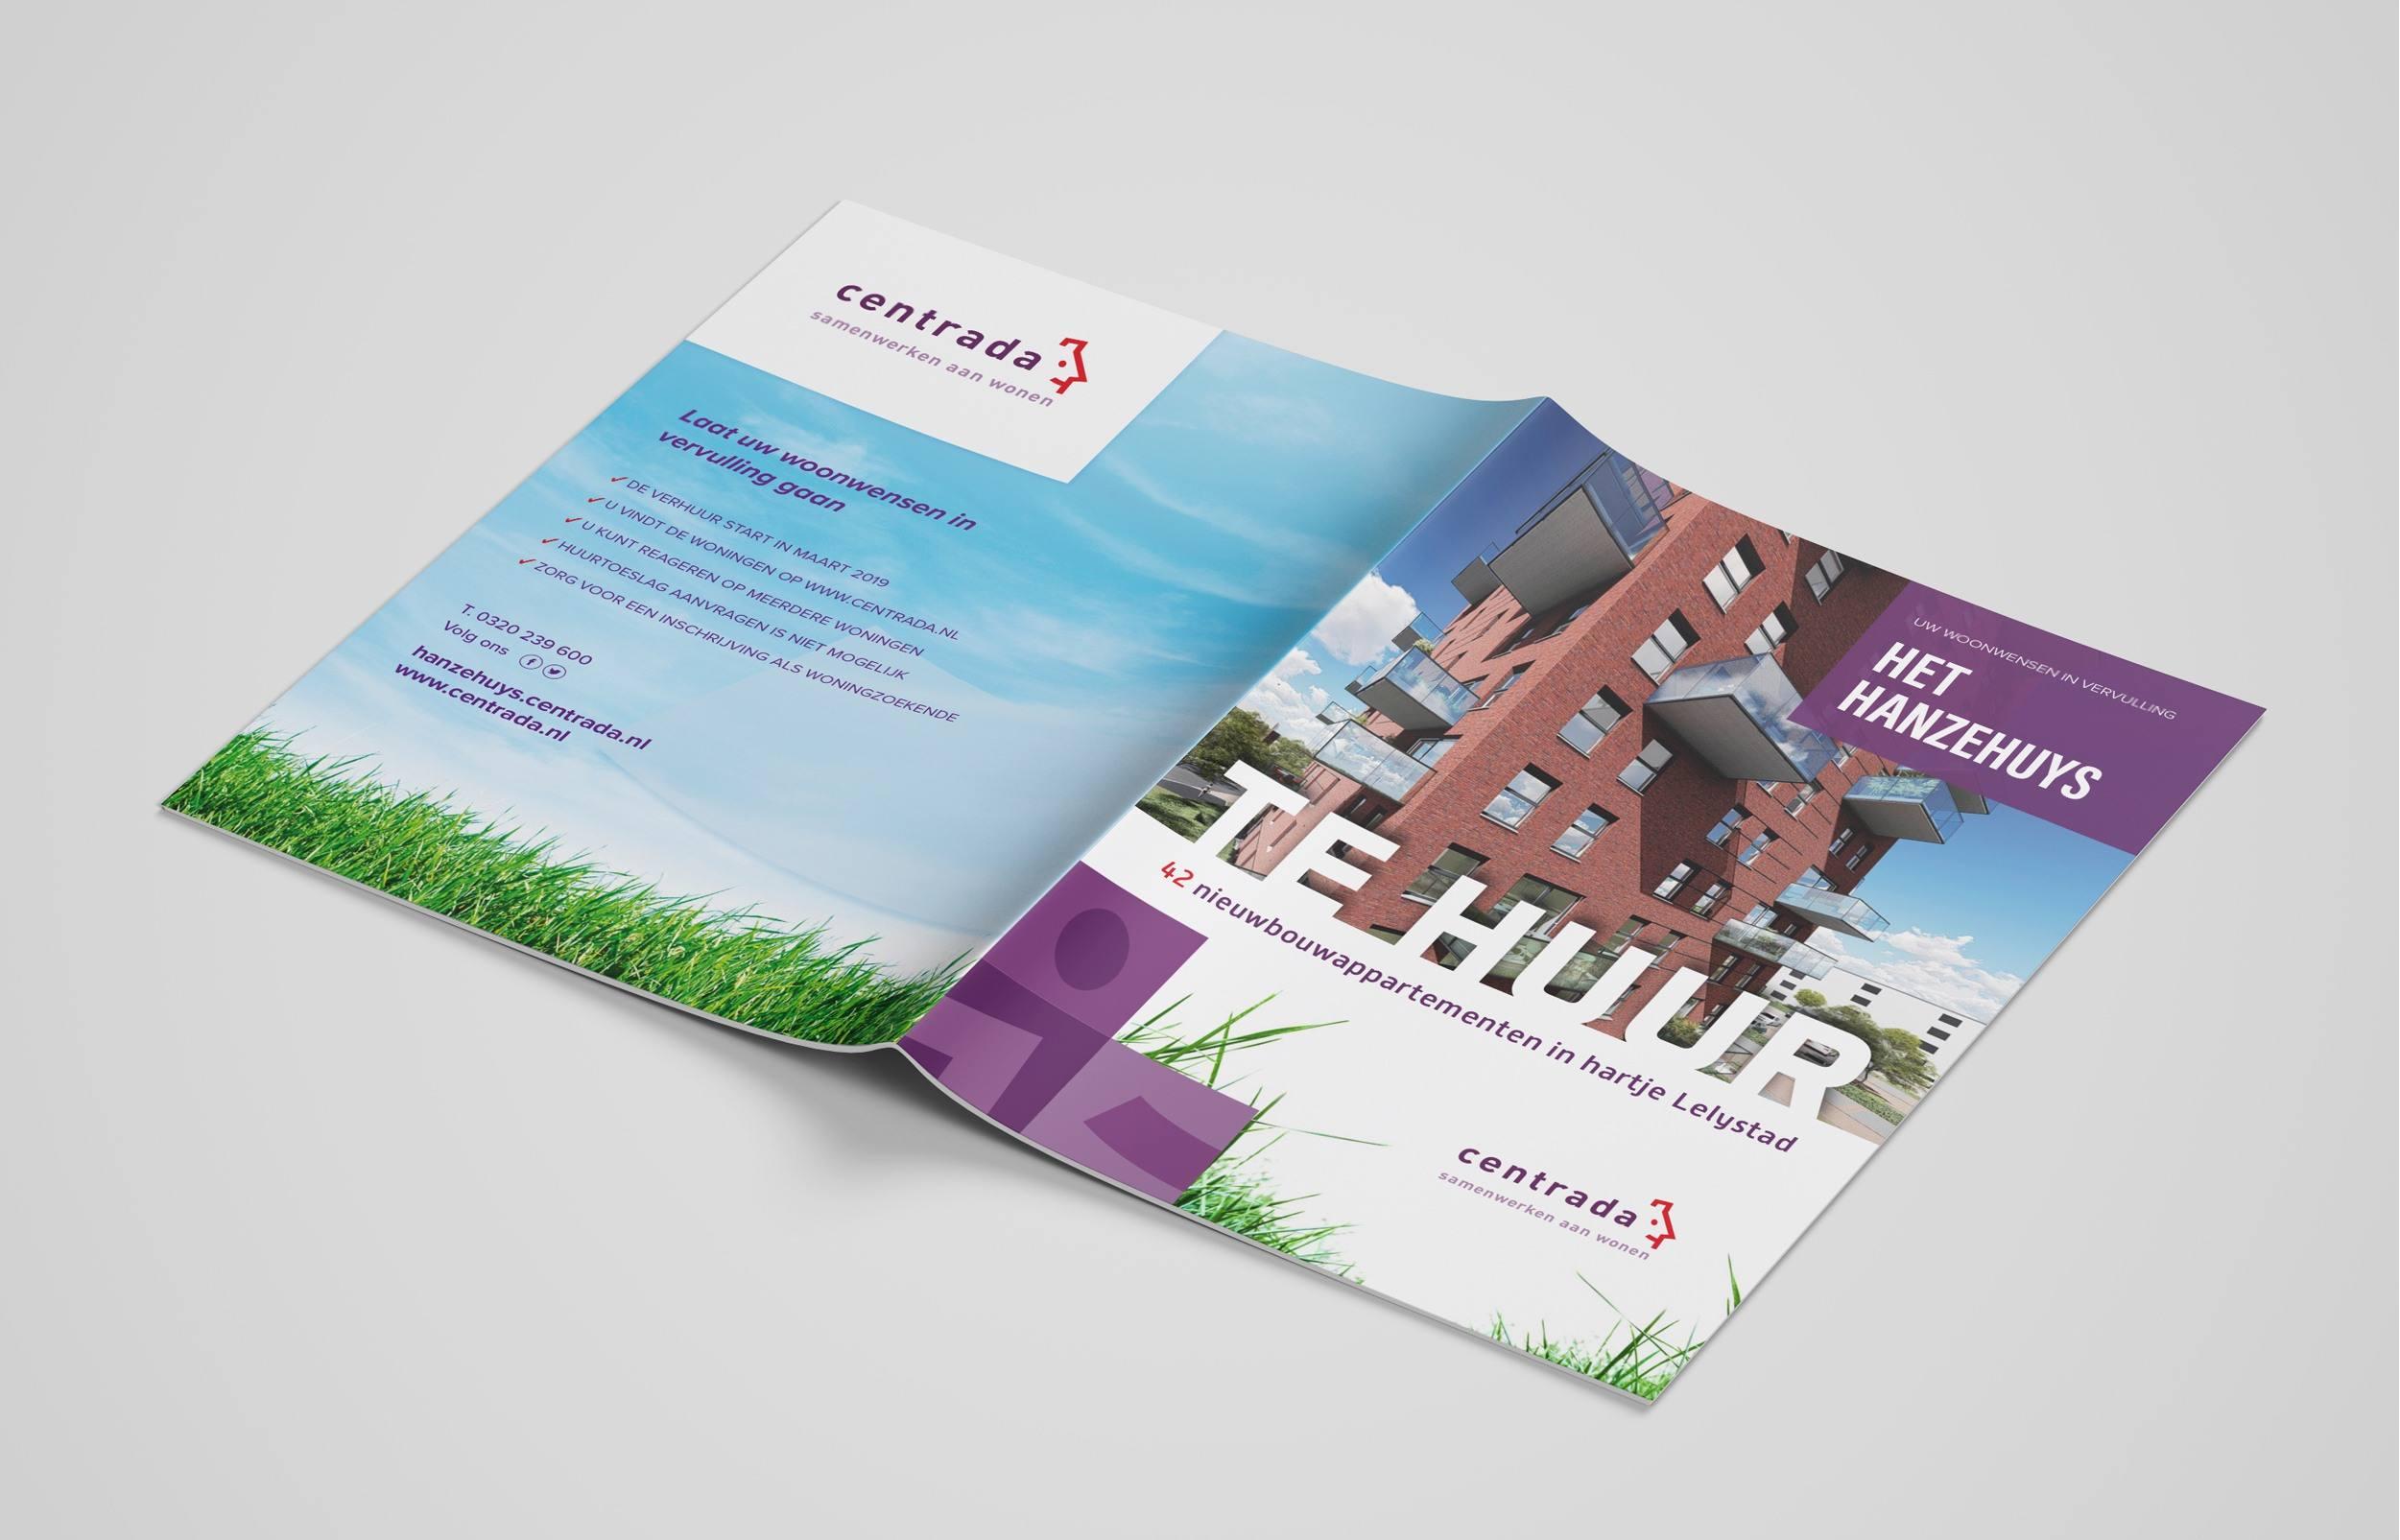 Centrada-Mockup-Brochure